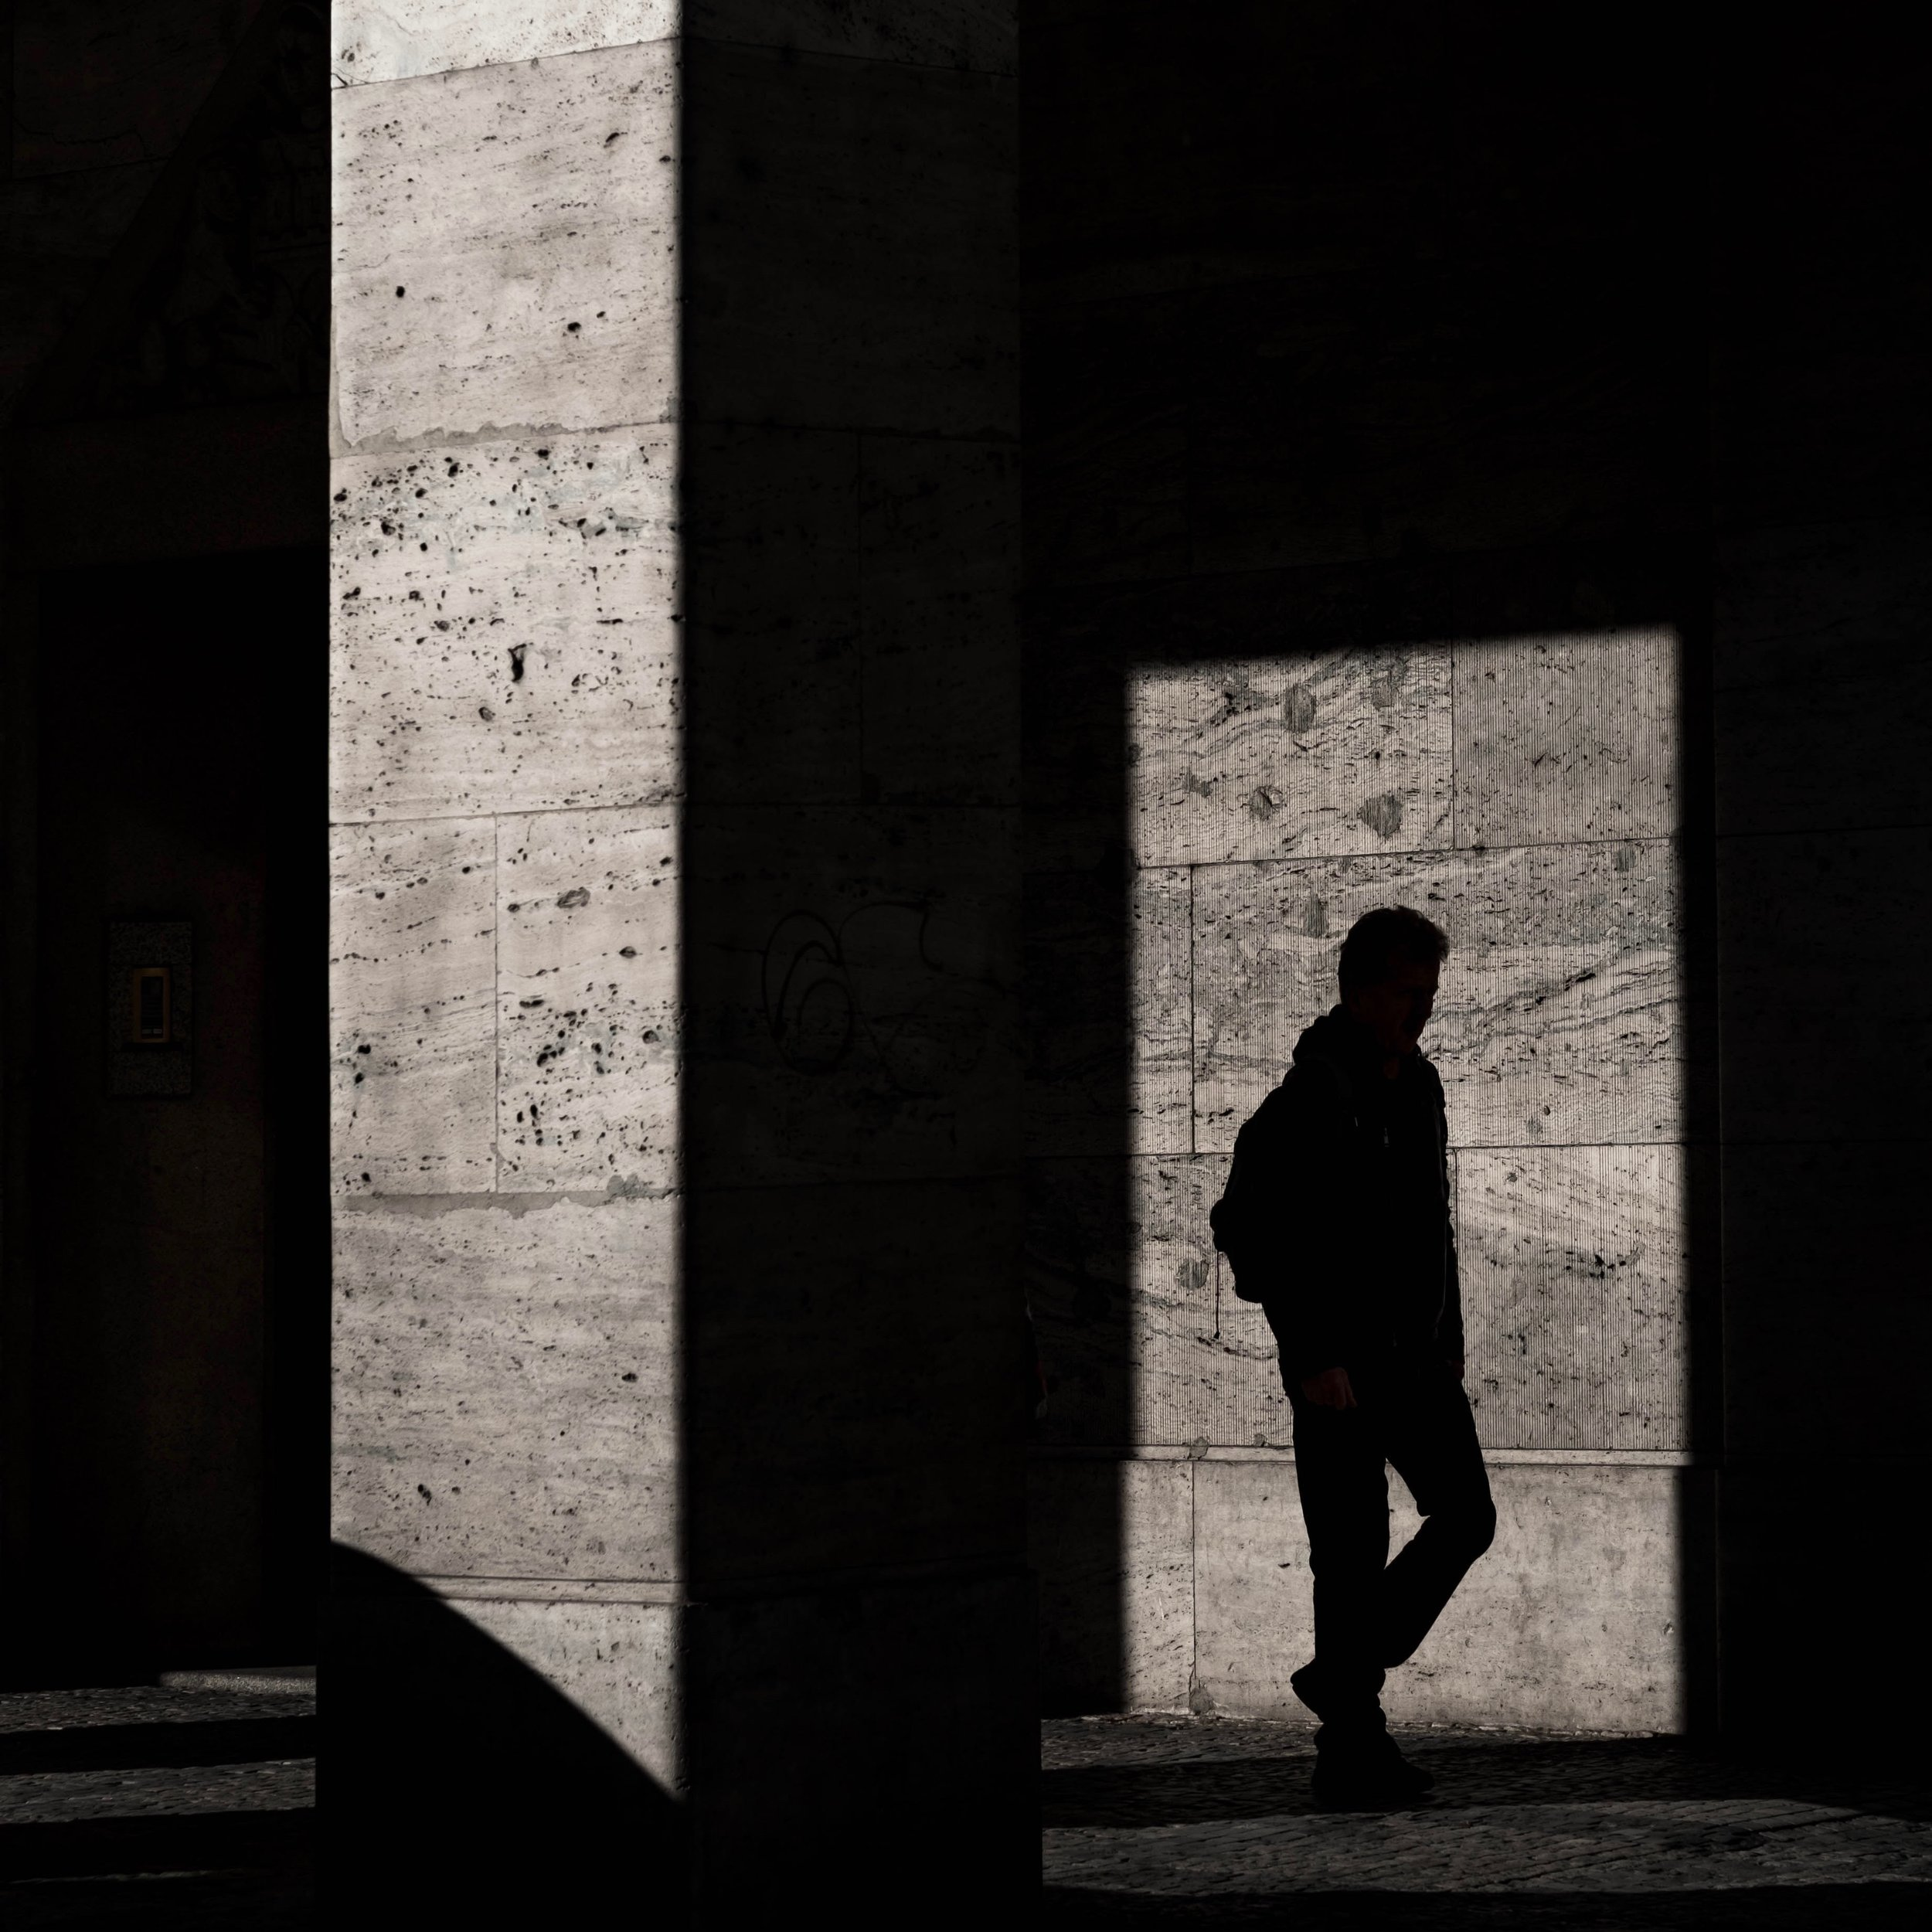 Photo by Rene Bohmer via Unsplash